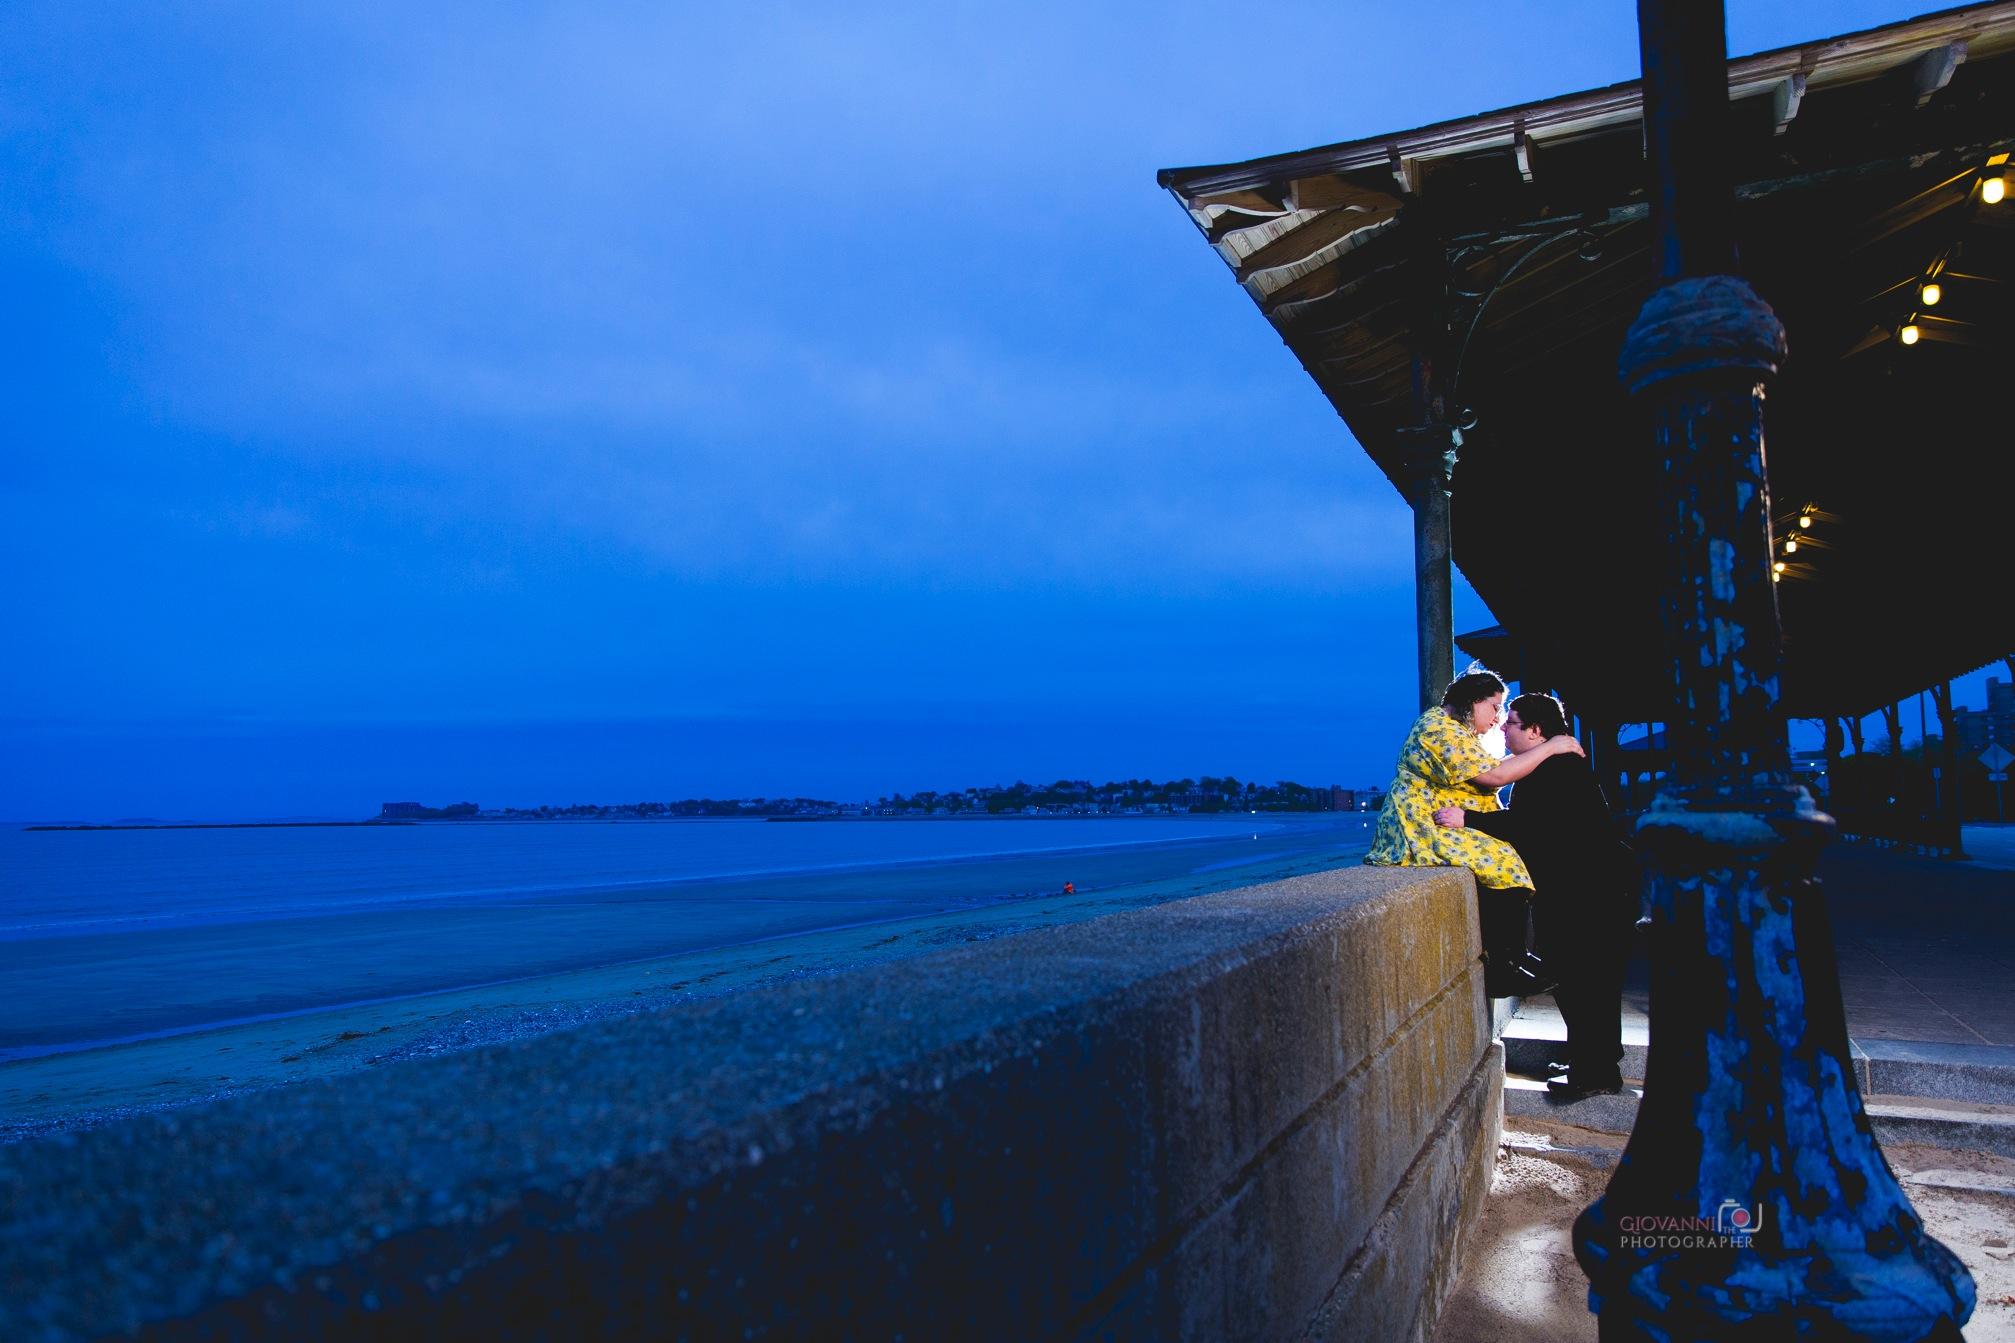 8C2A8566 Giovanni The Photographer Boston Engagement Phohotgraphy Revere Bridge - Megan and Andrew WM35.jpg